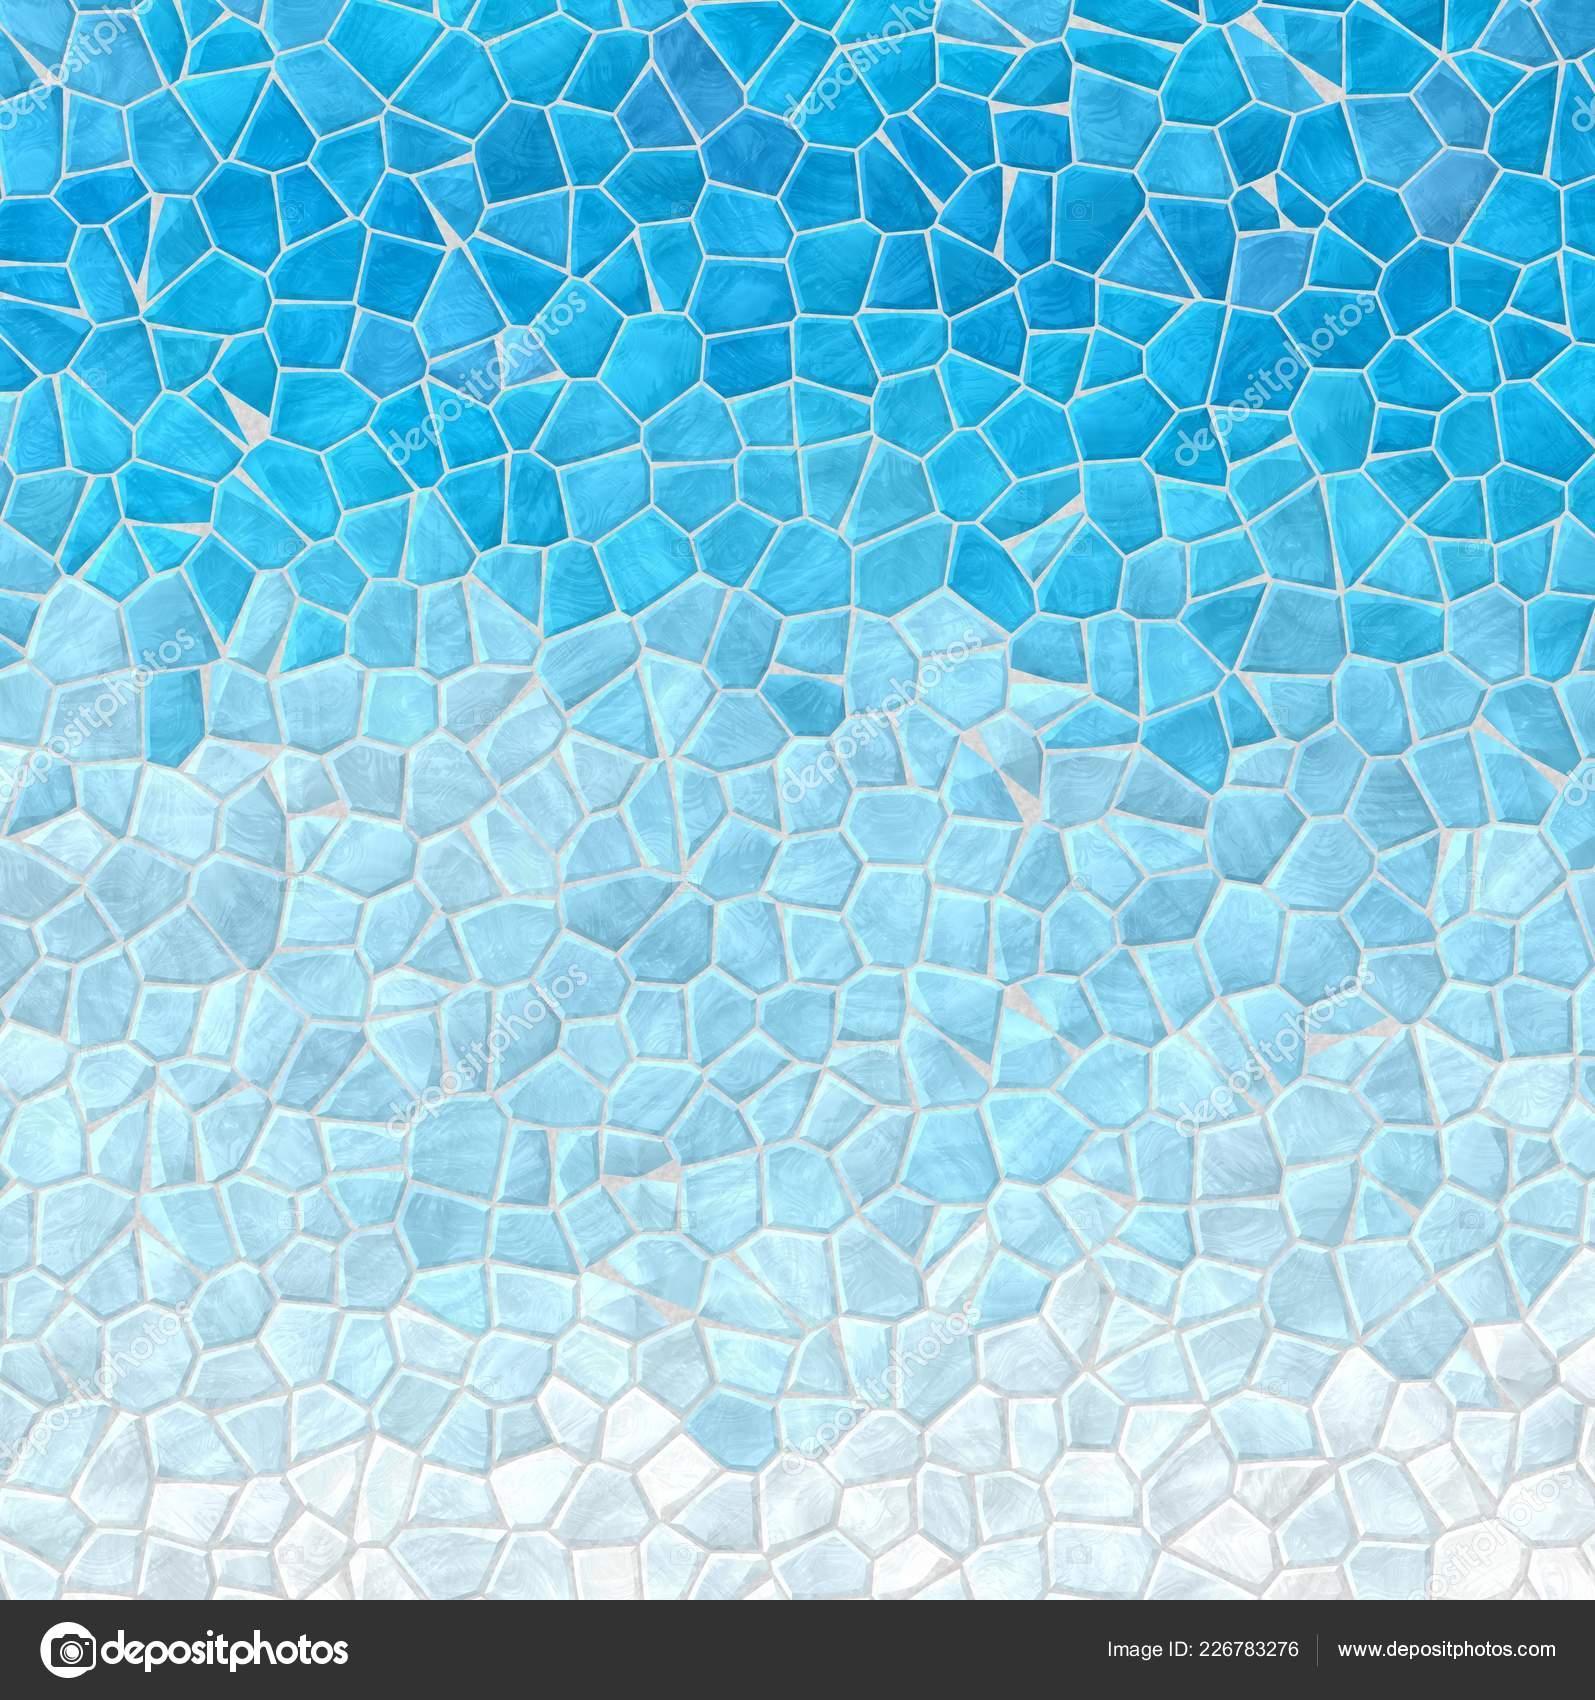 Natura Astratta Marmo Mosaico Pietroso Plastica Piastrelle Texture